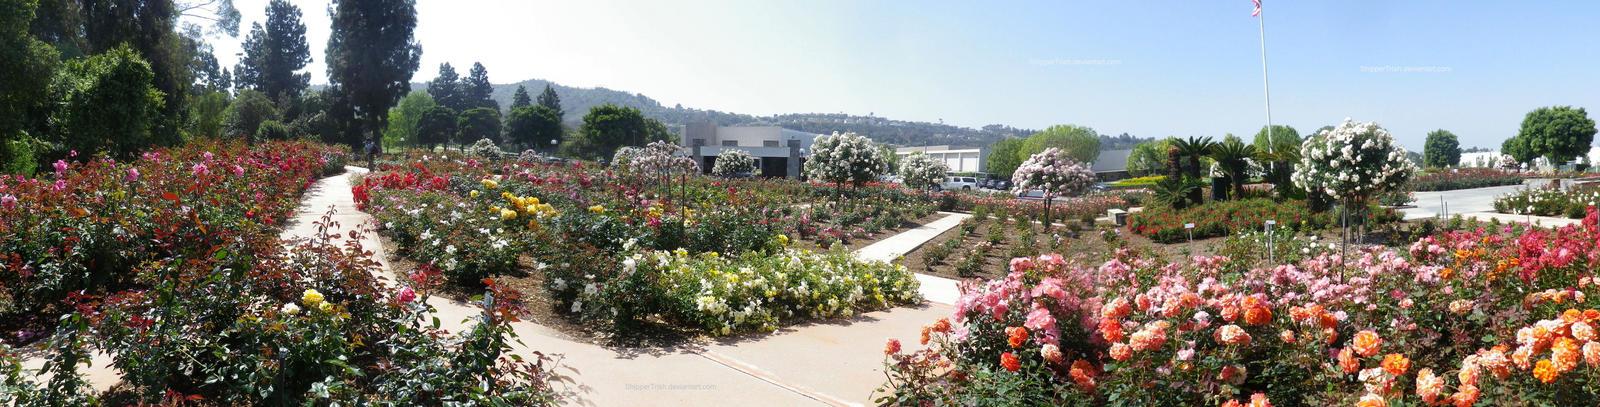 Rose Garden Panorama 2 by ShipperTrish